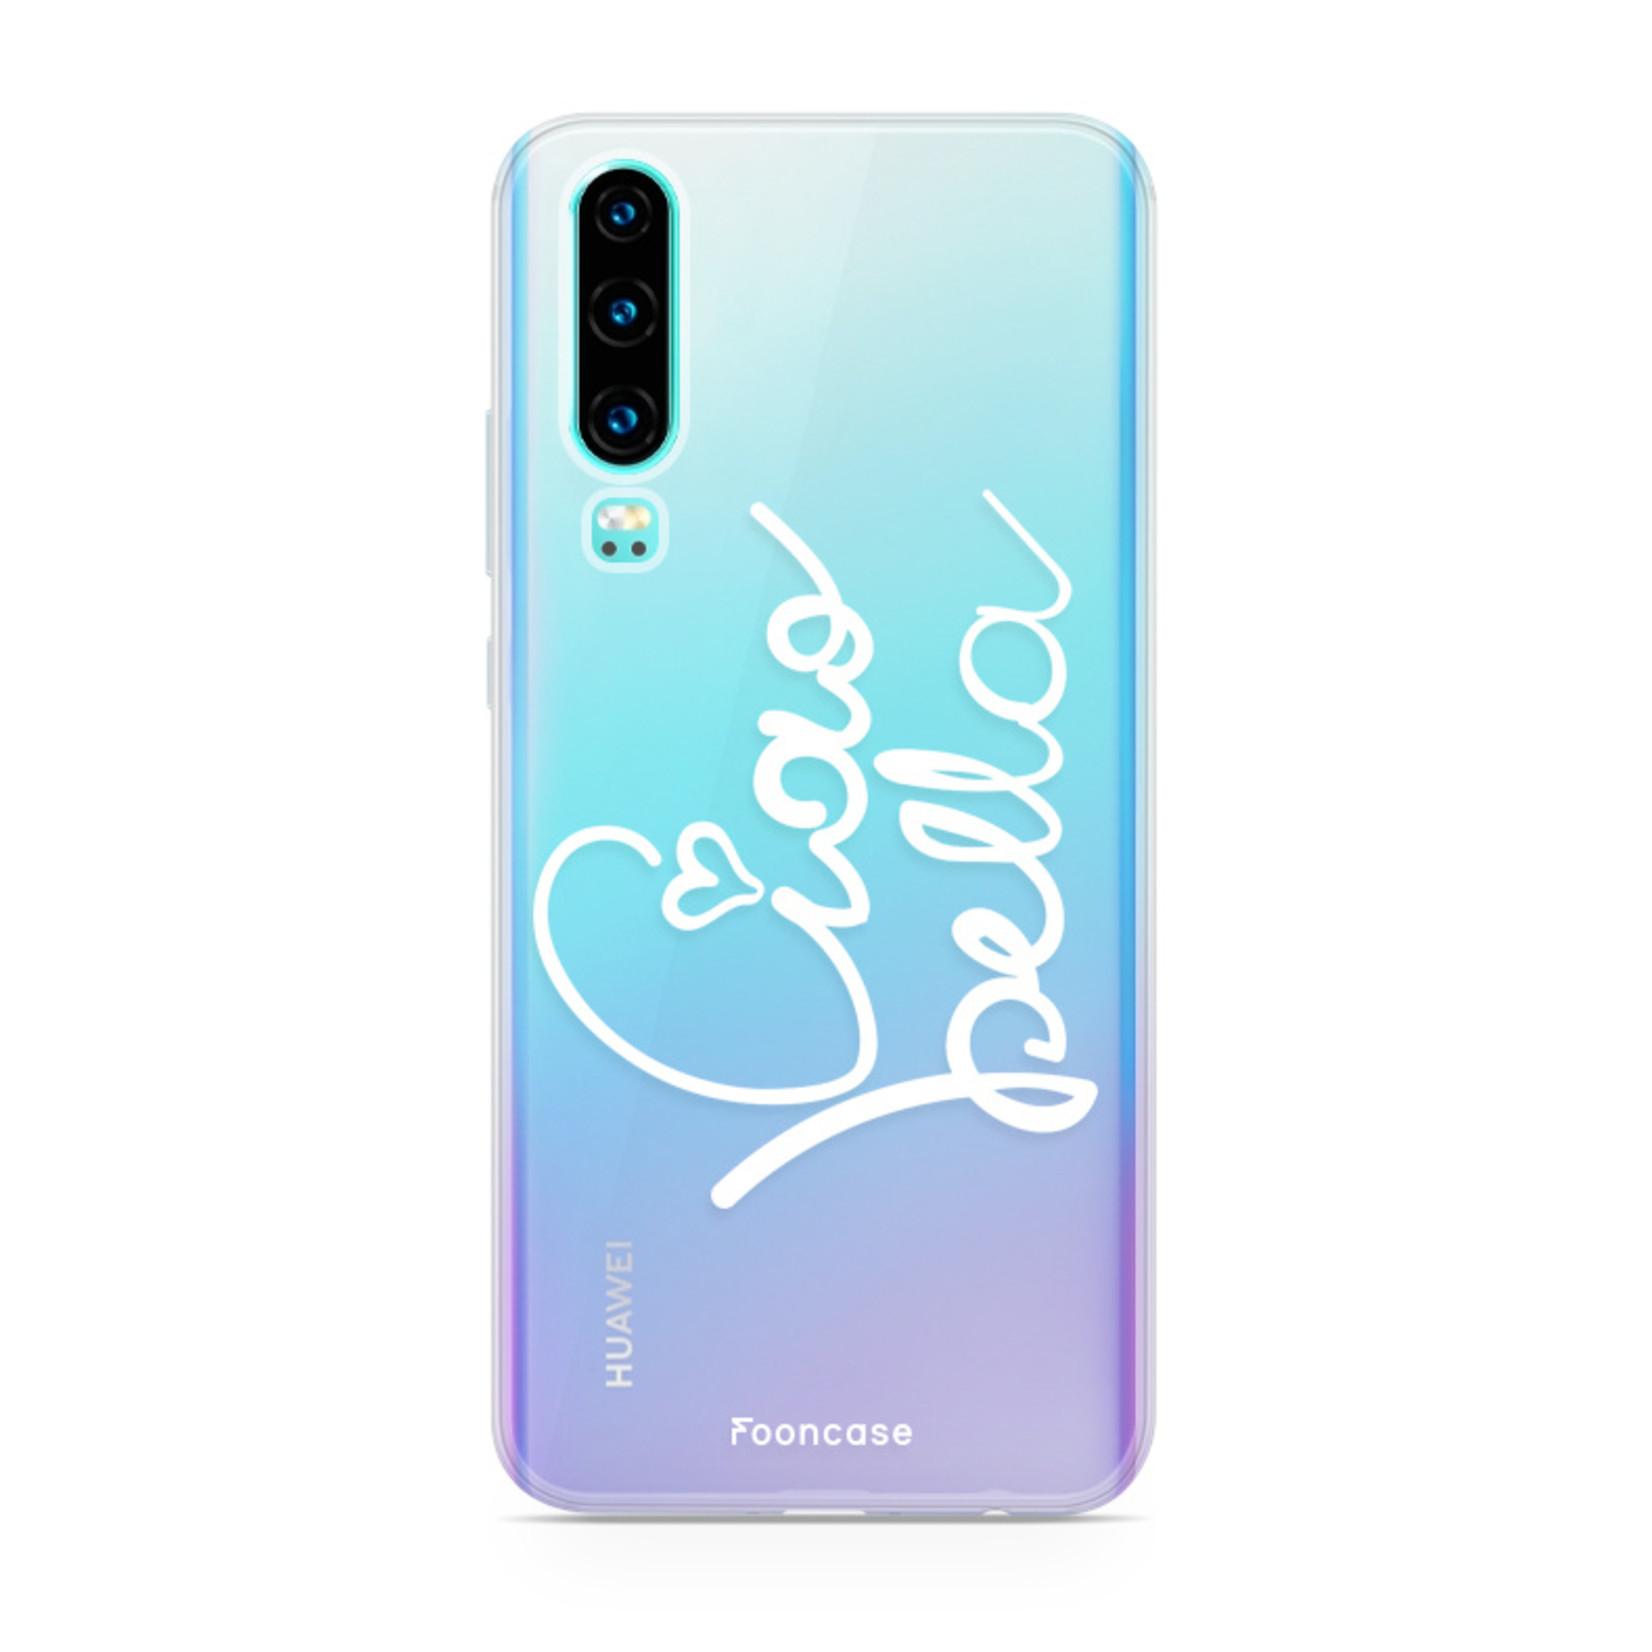 FOONCASE Huawei P30 Handyhülle - Ciao Bella!